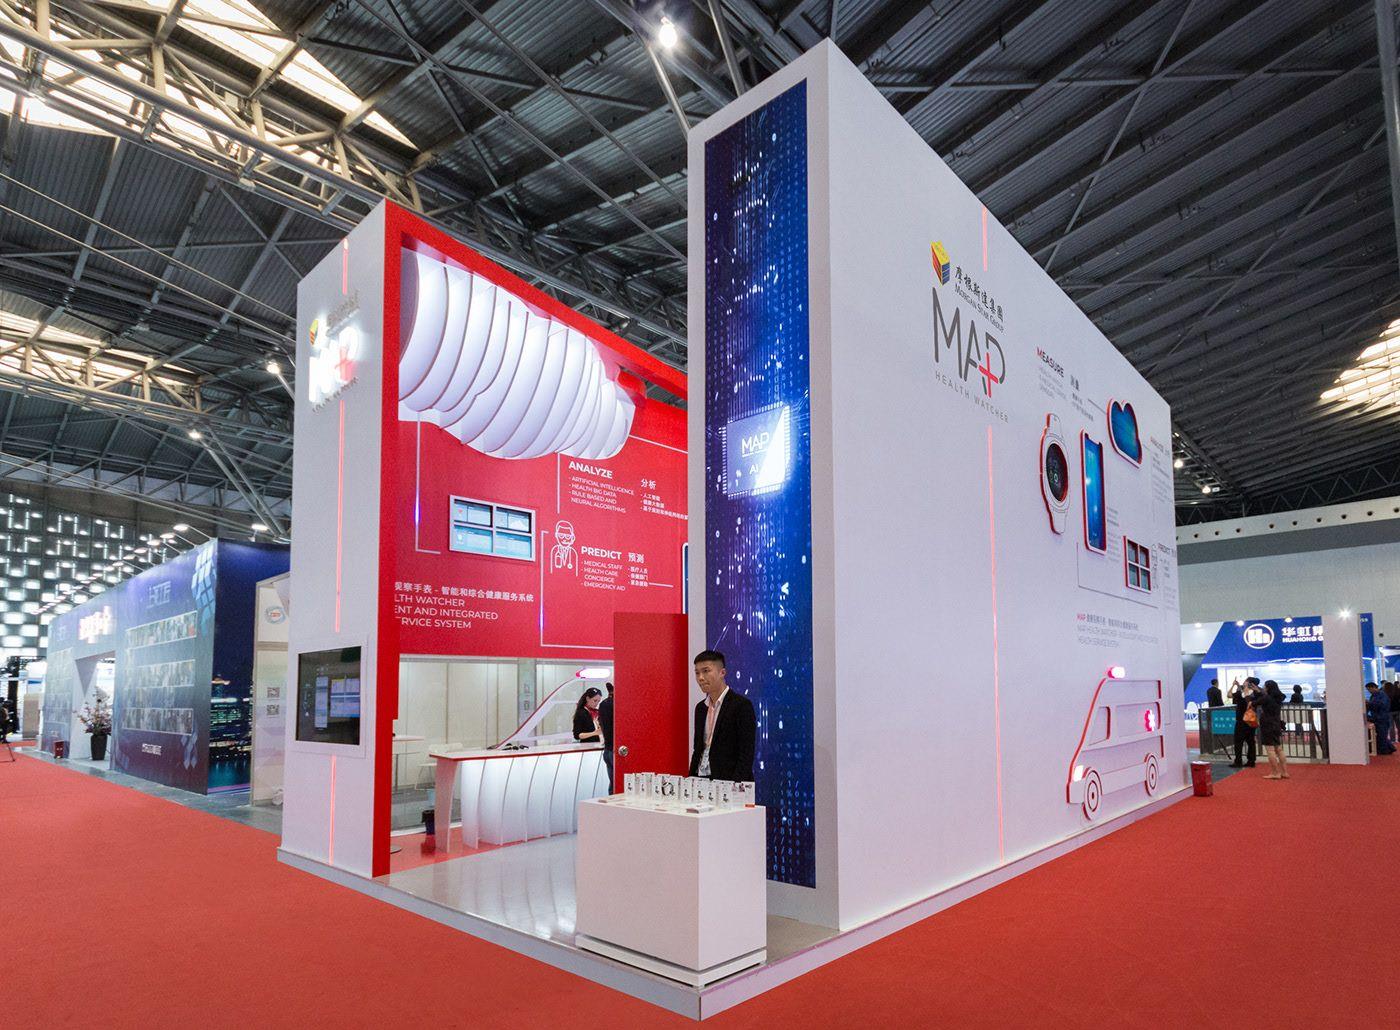 Map Healthwatch Pavilion Csitf 2019 On Behance Pavilion Design